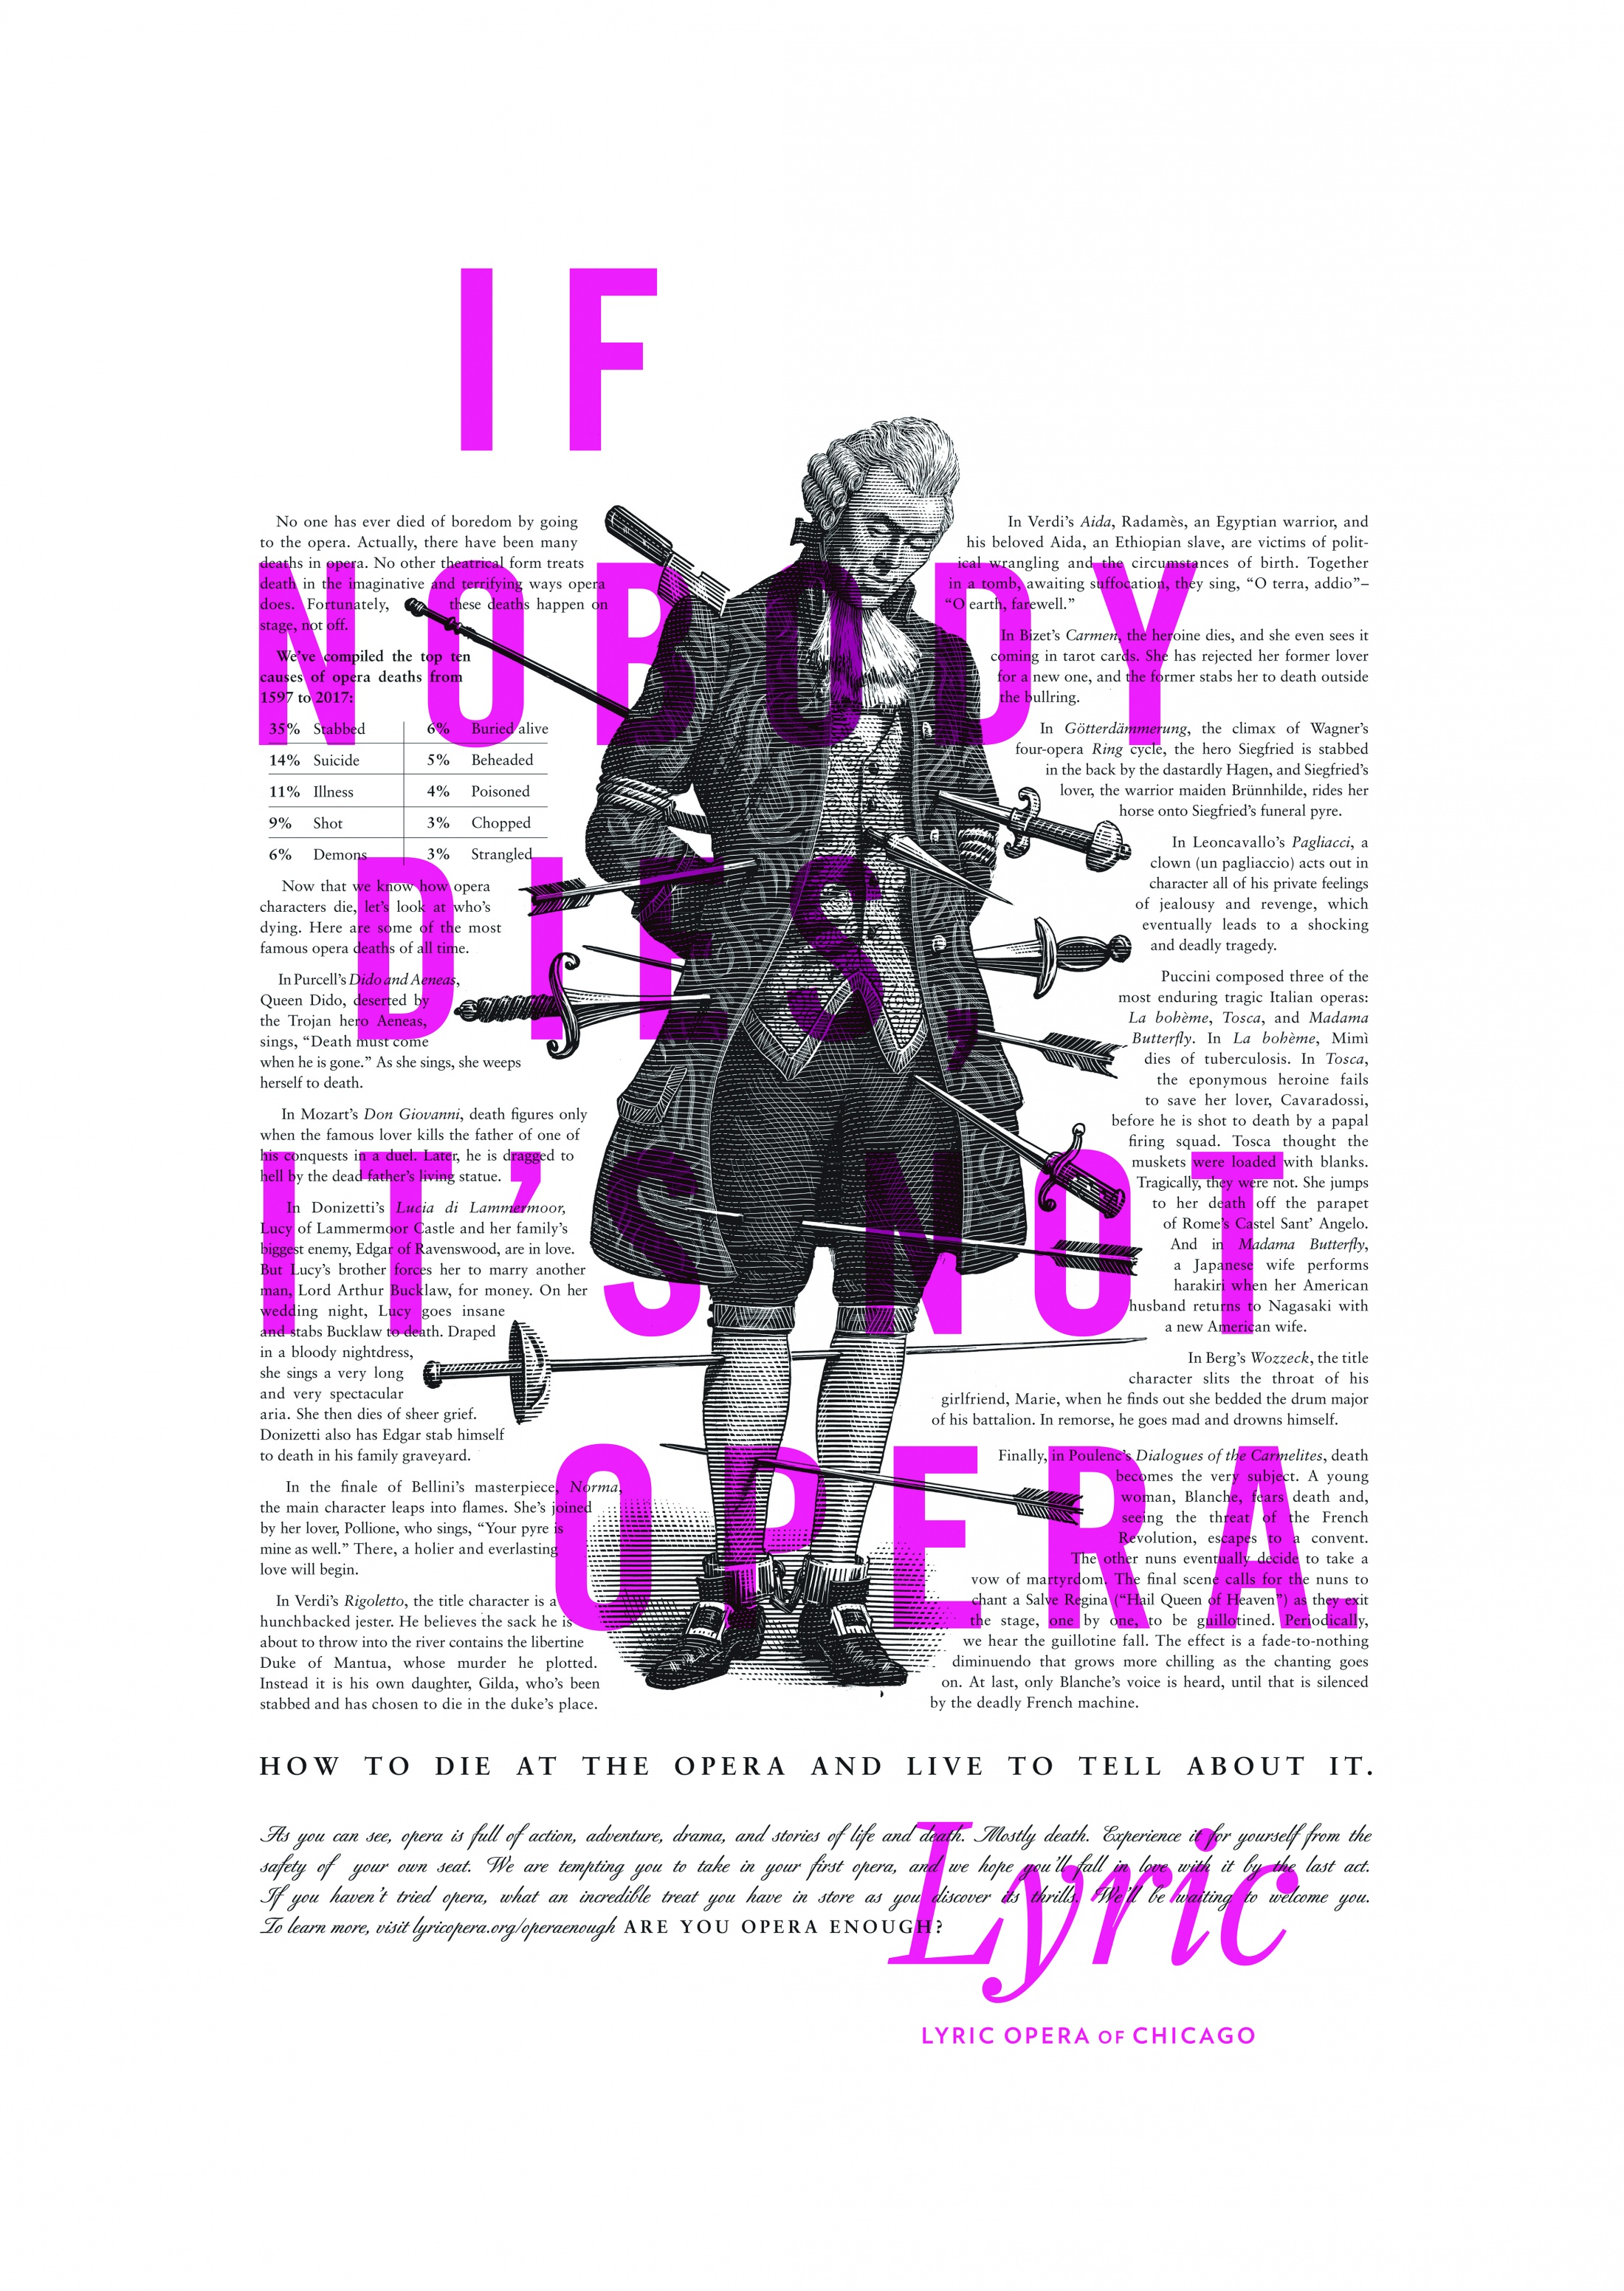 Thumbnail for Lyric Opera Print: Deaths